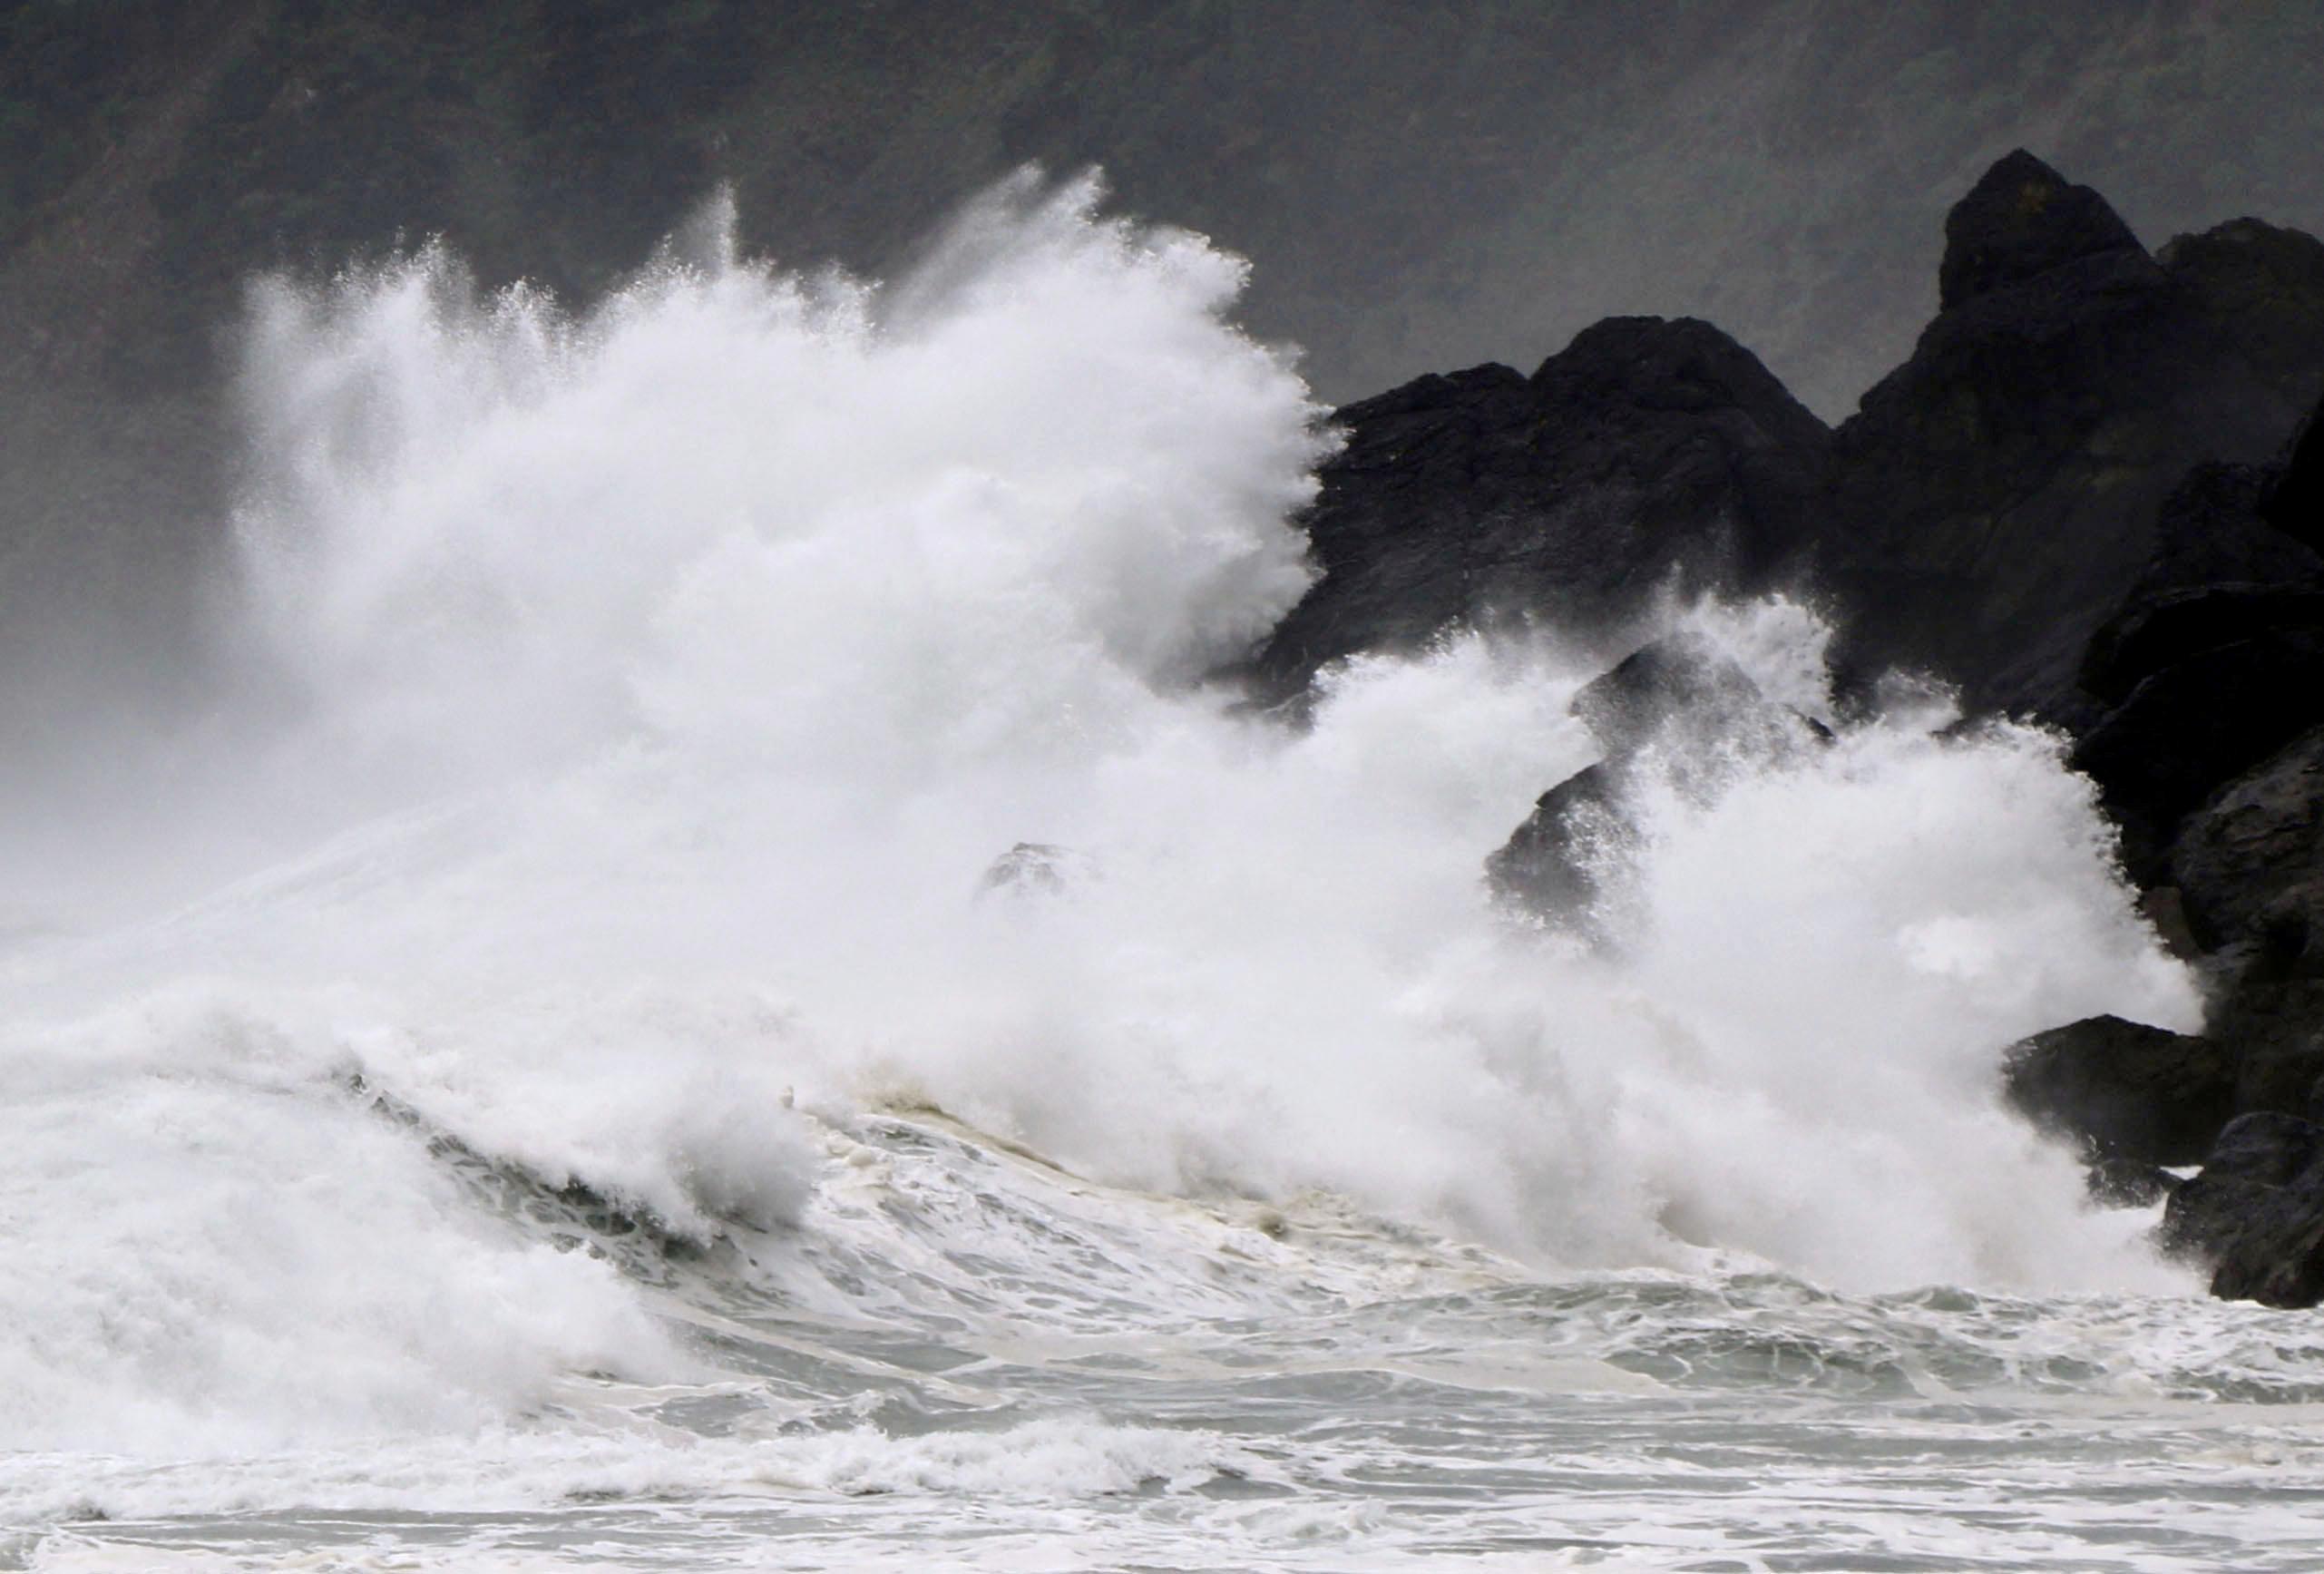 Сотни тысяч японцев предупредили об эвакуации из-за тайфуна